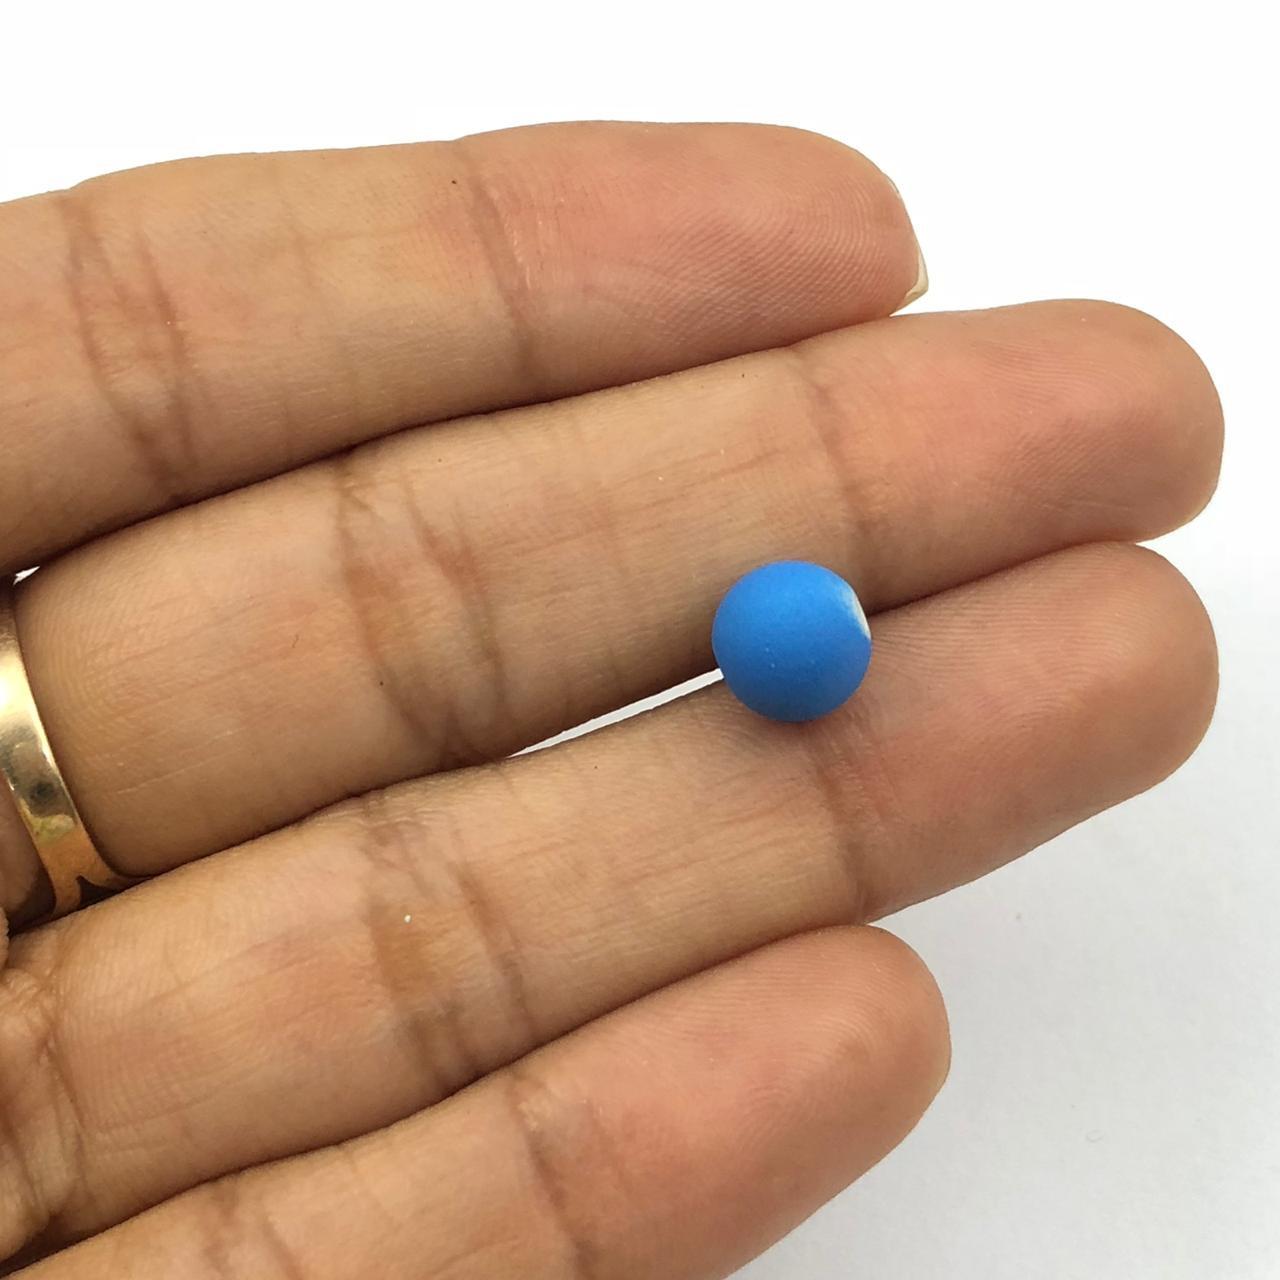 BOL191 - Bola Emborrachada Azul 8mm - 20Grs